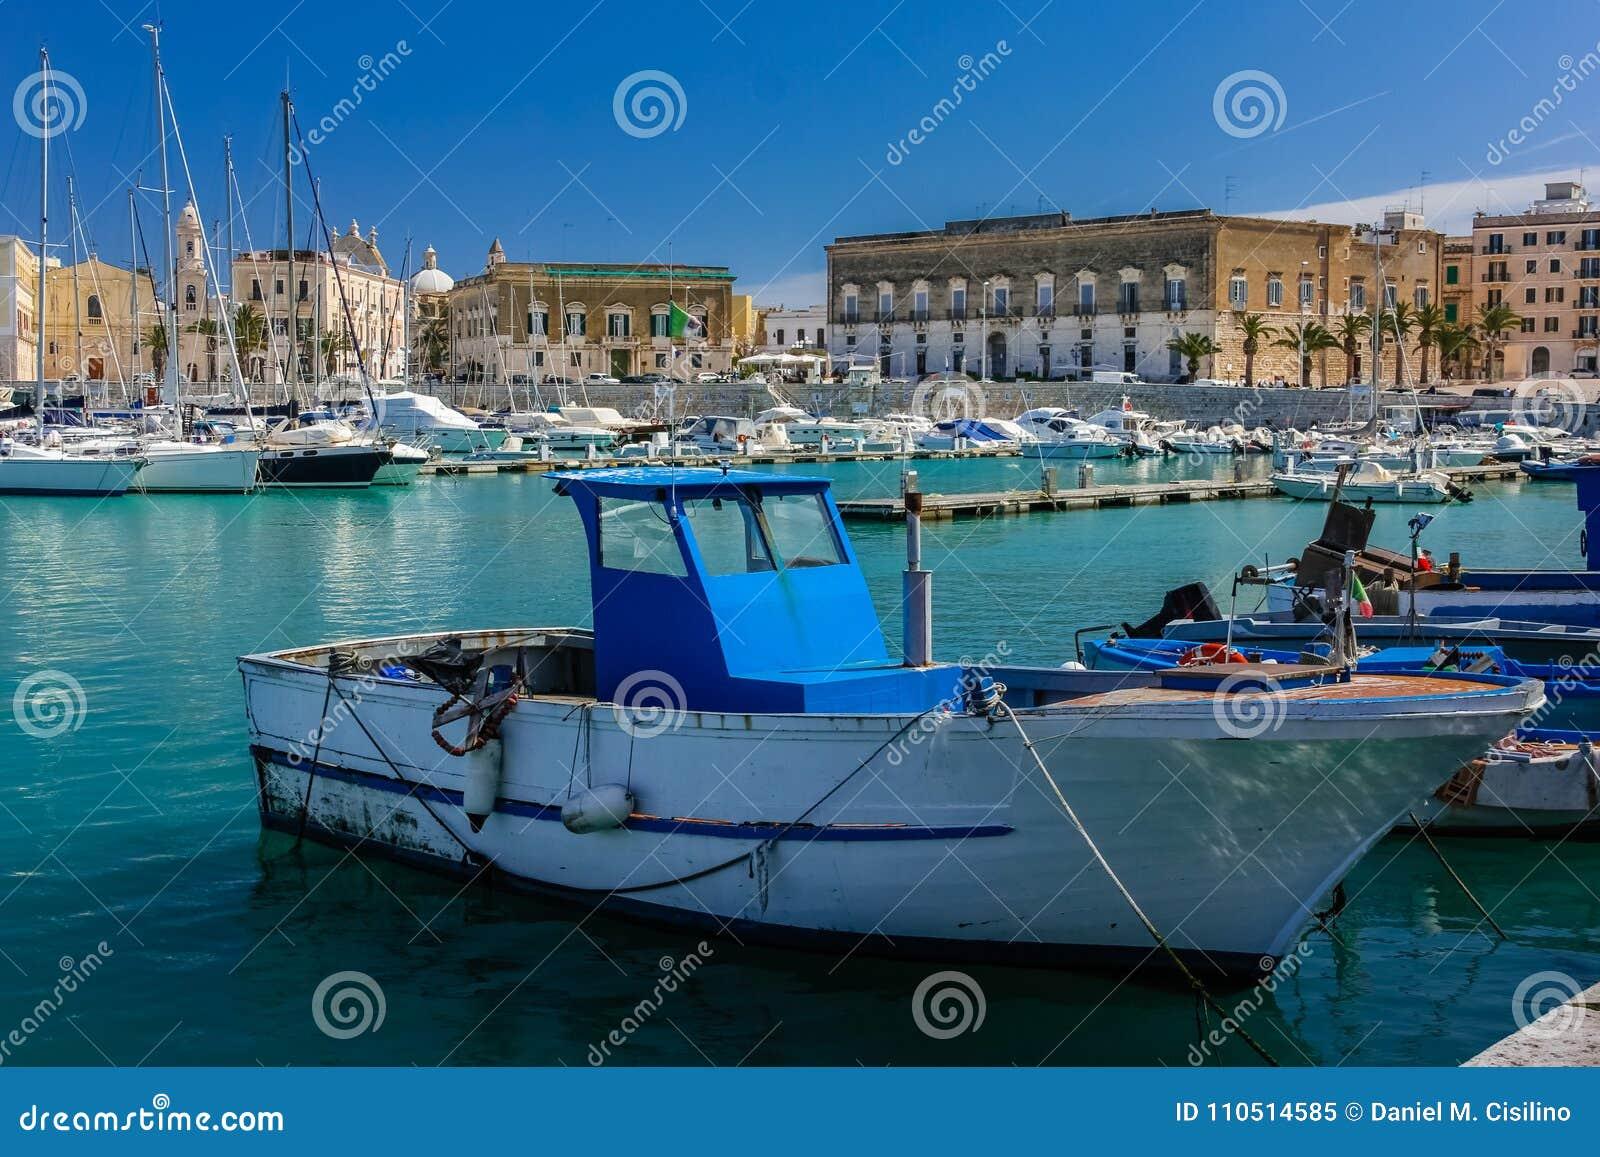 The harbour. Trani. Apulia. Italy